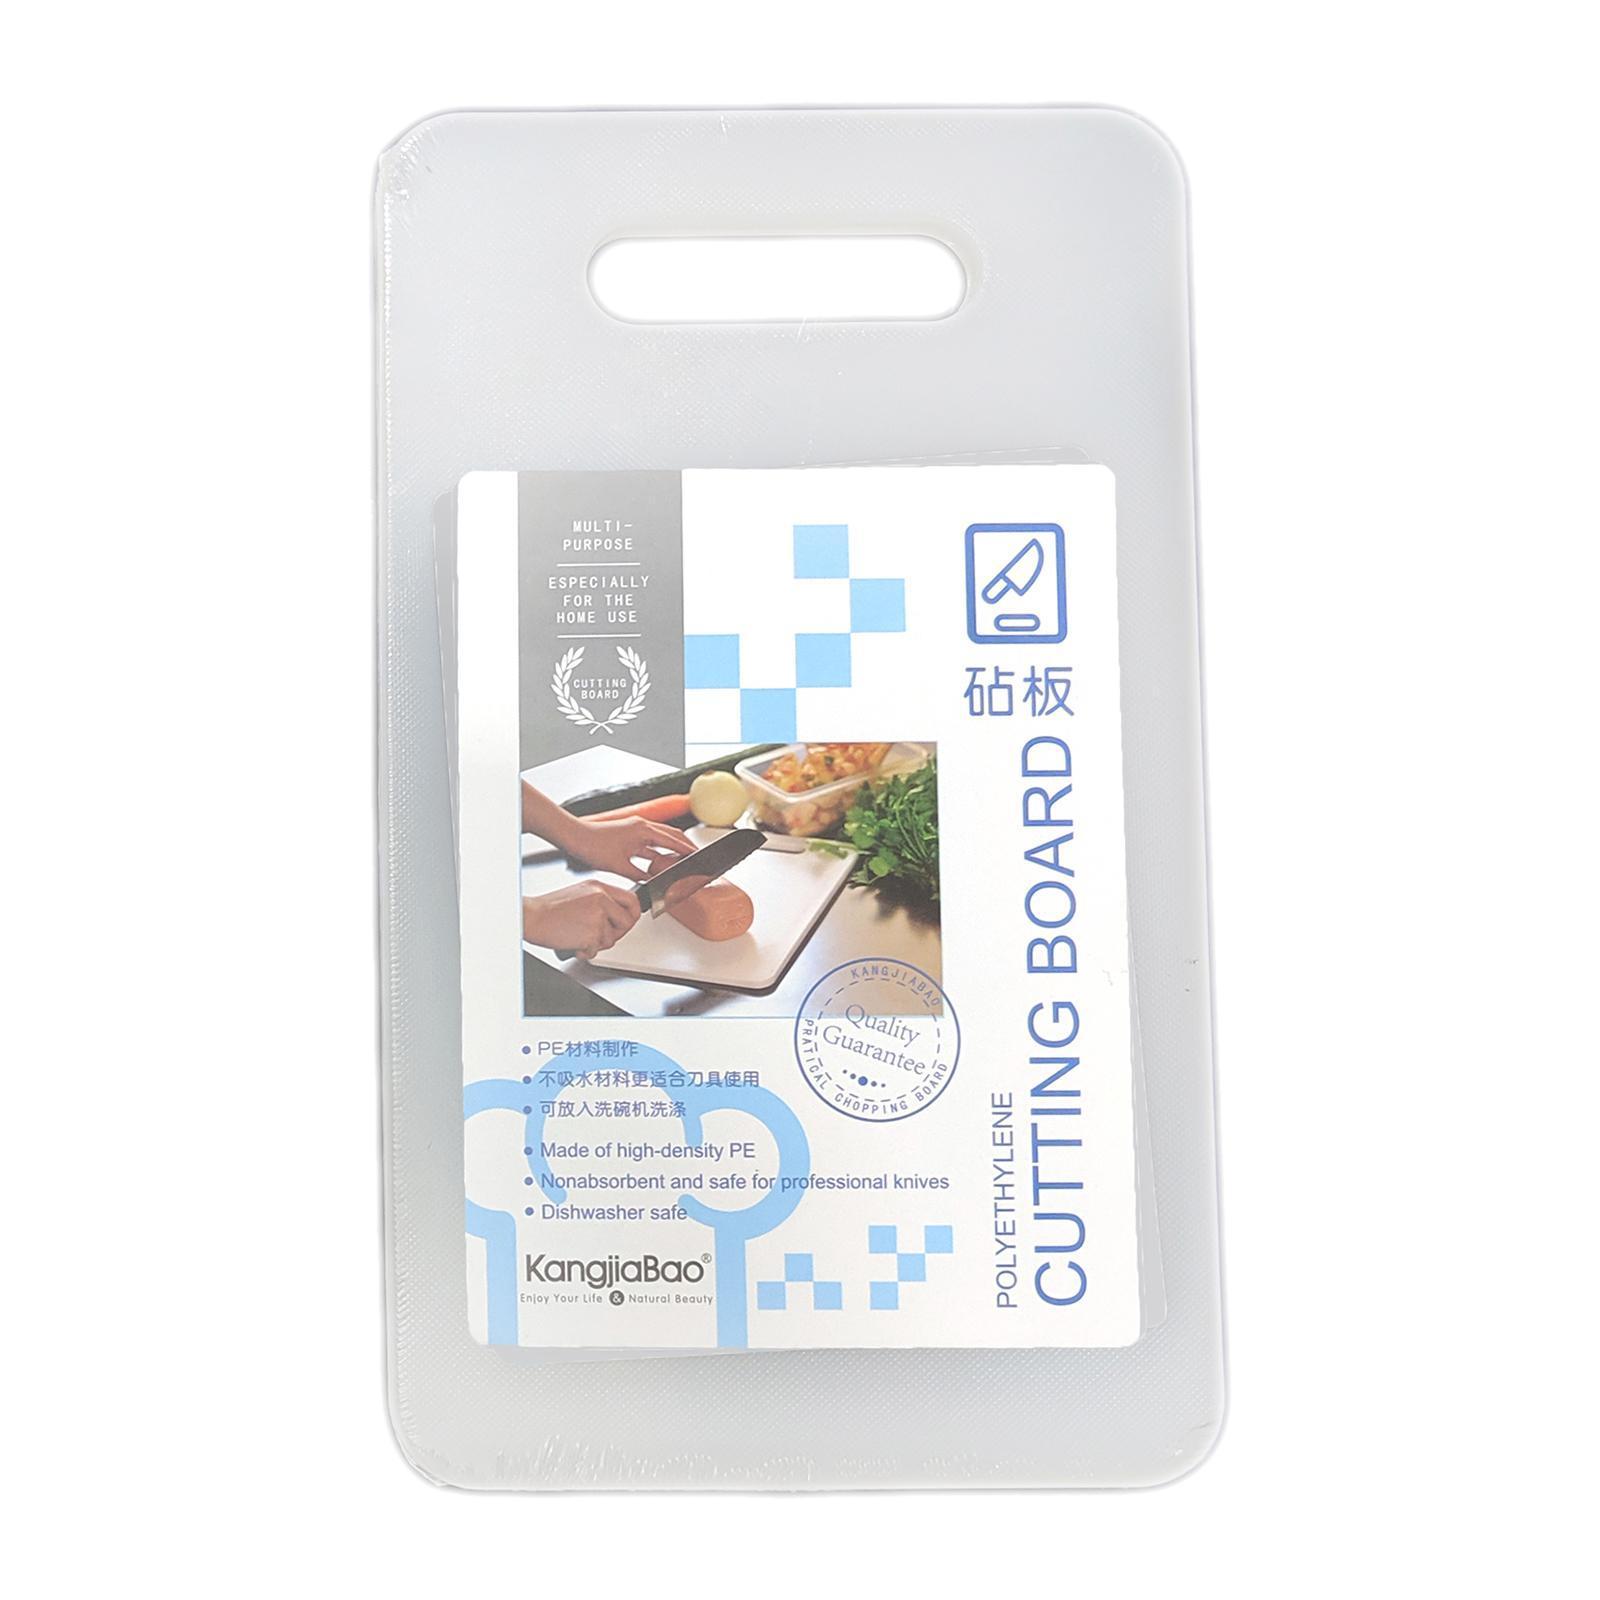 KangjiaBao Small Plastic Chopping Board 25x15 CM